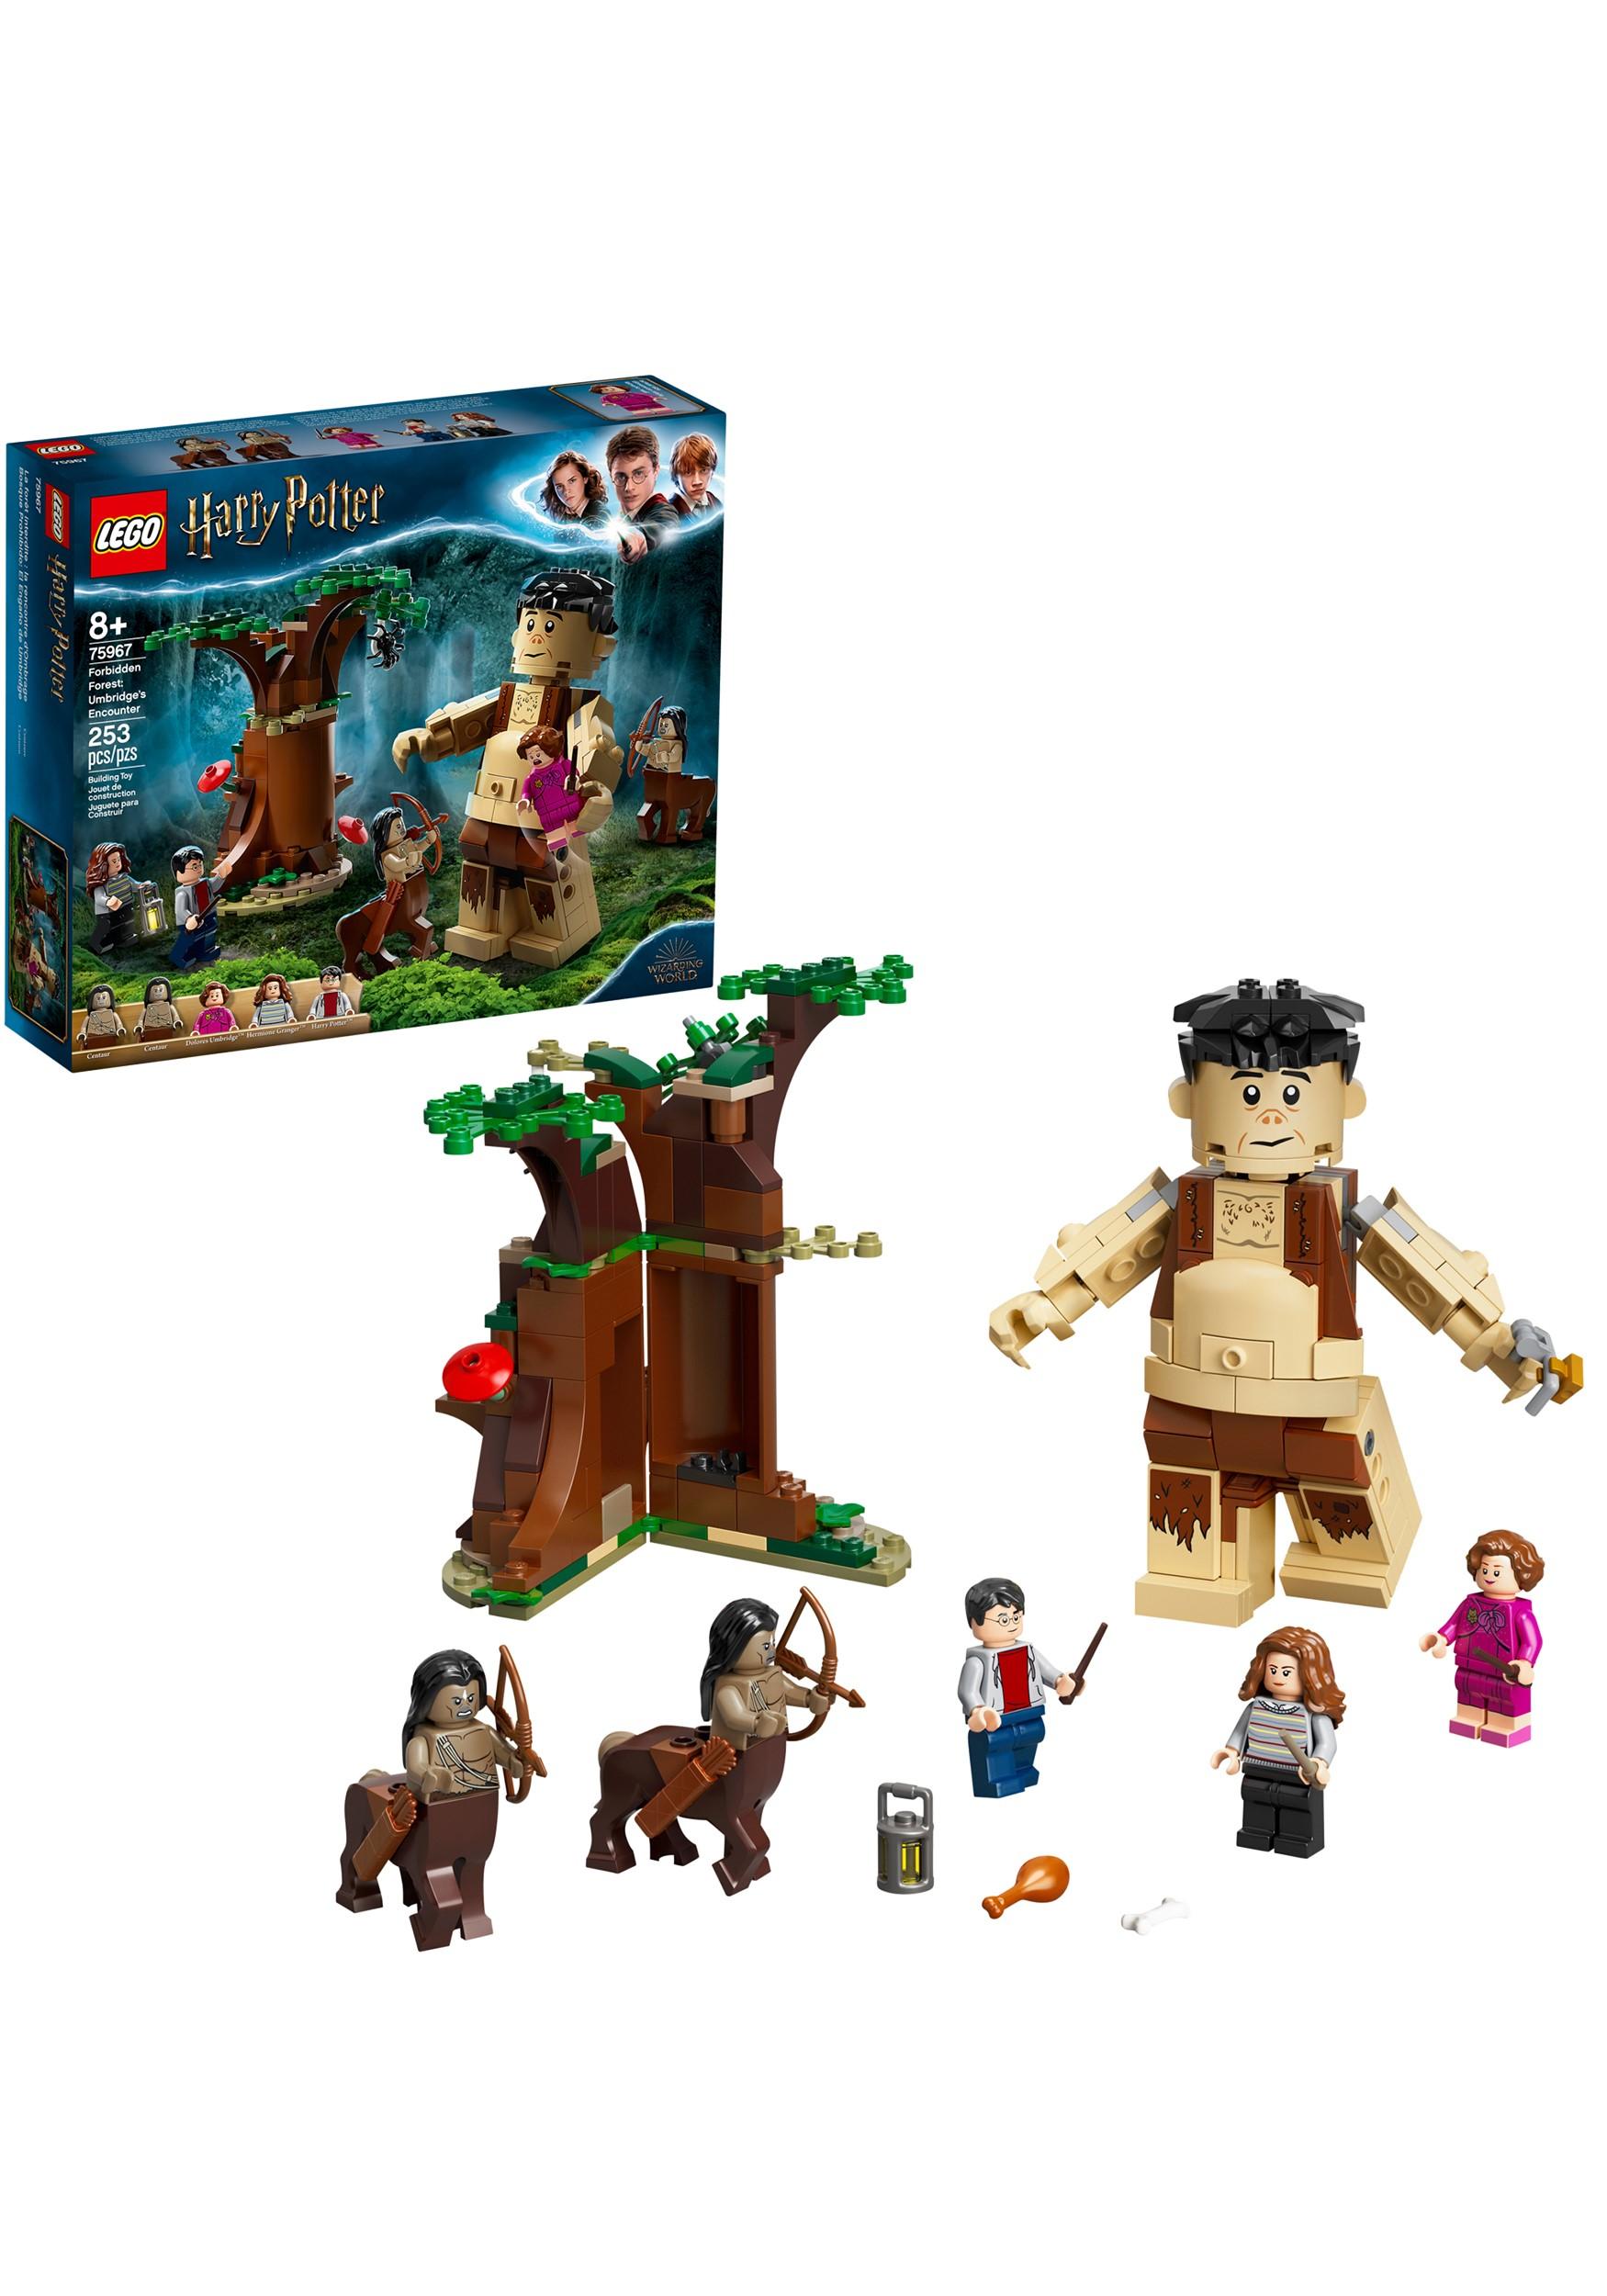 Harry Potter Forbidden Forest: Umbridge's Encounter - LEGO Set